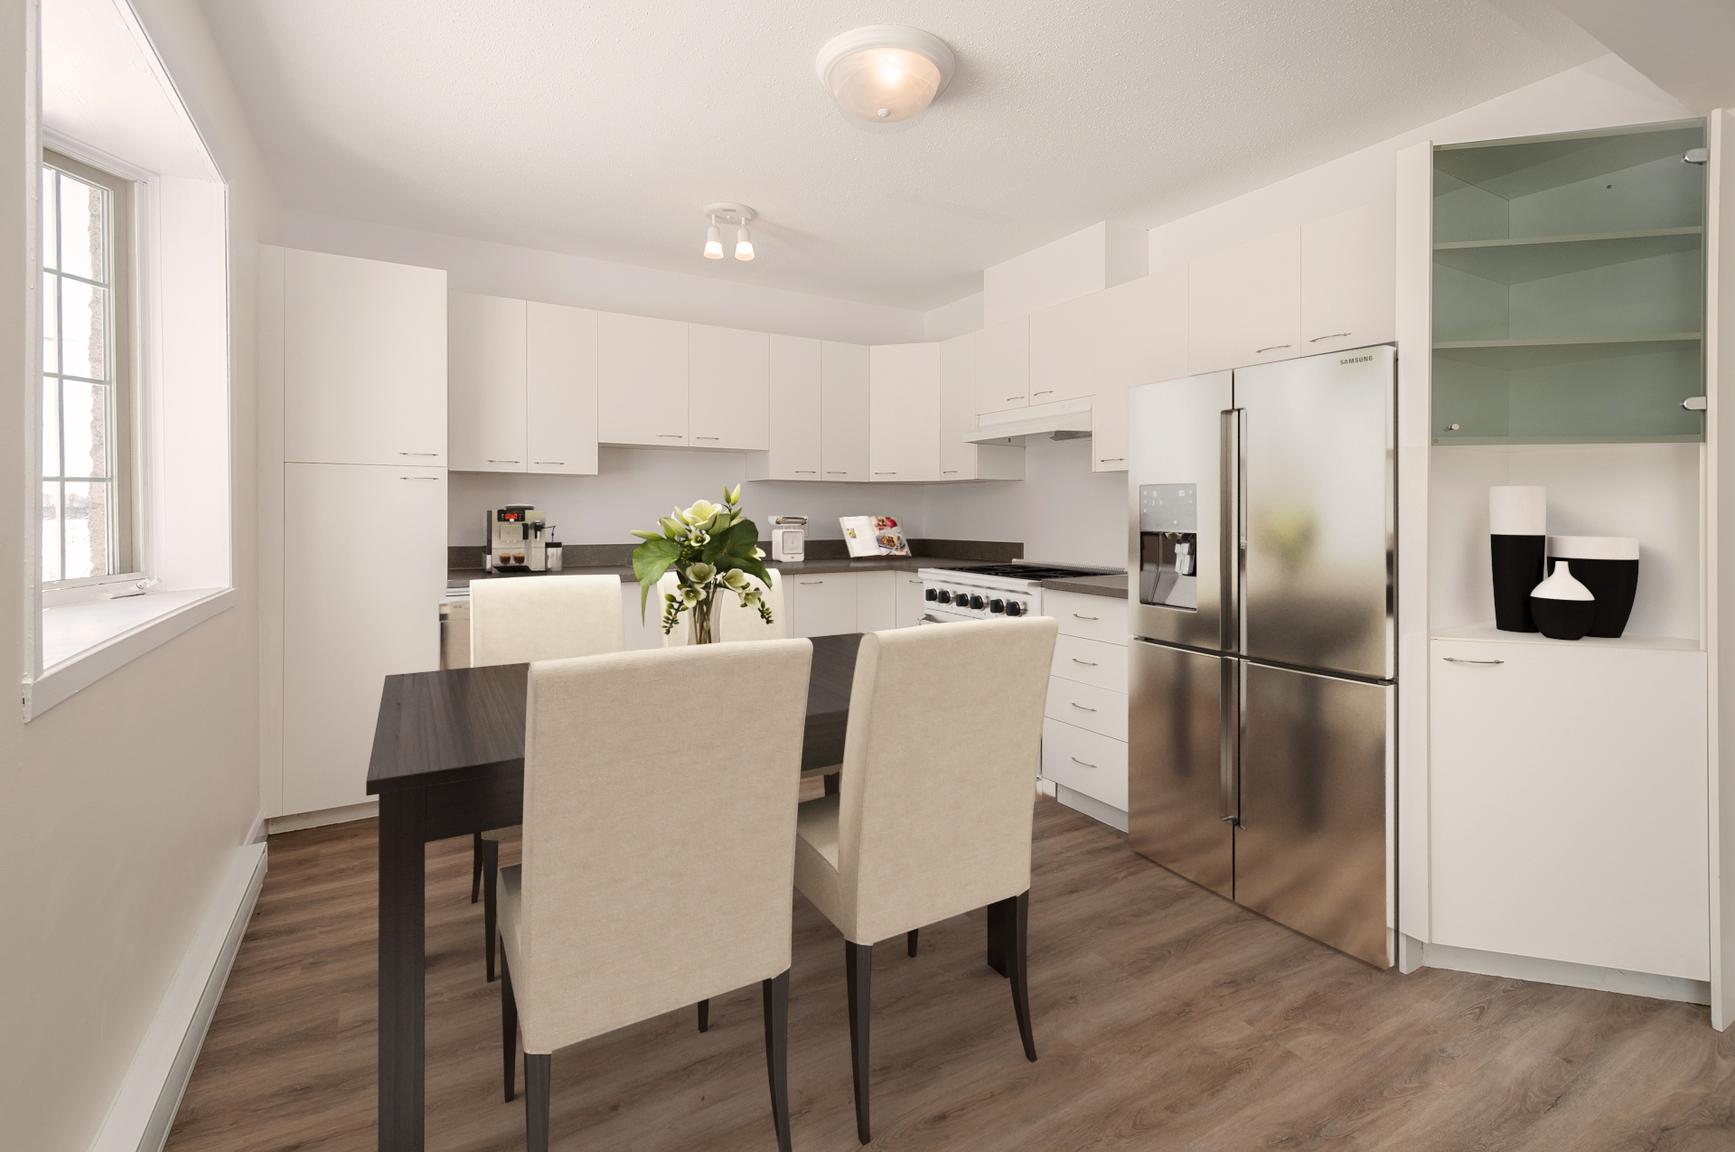 2 bedroom Apartments for rent in Quebec City at Les Appartements du Verdier - Photo 21 - RentQuebecApartments – L407124